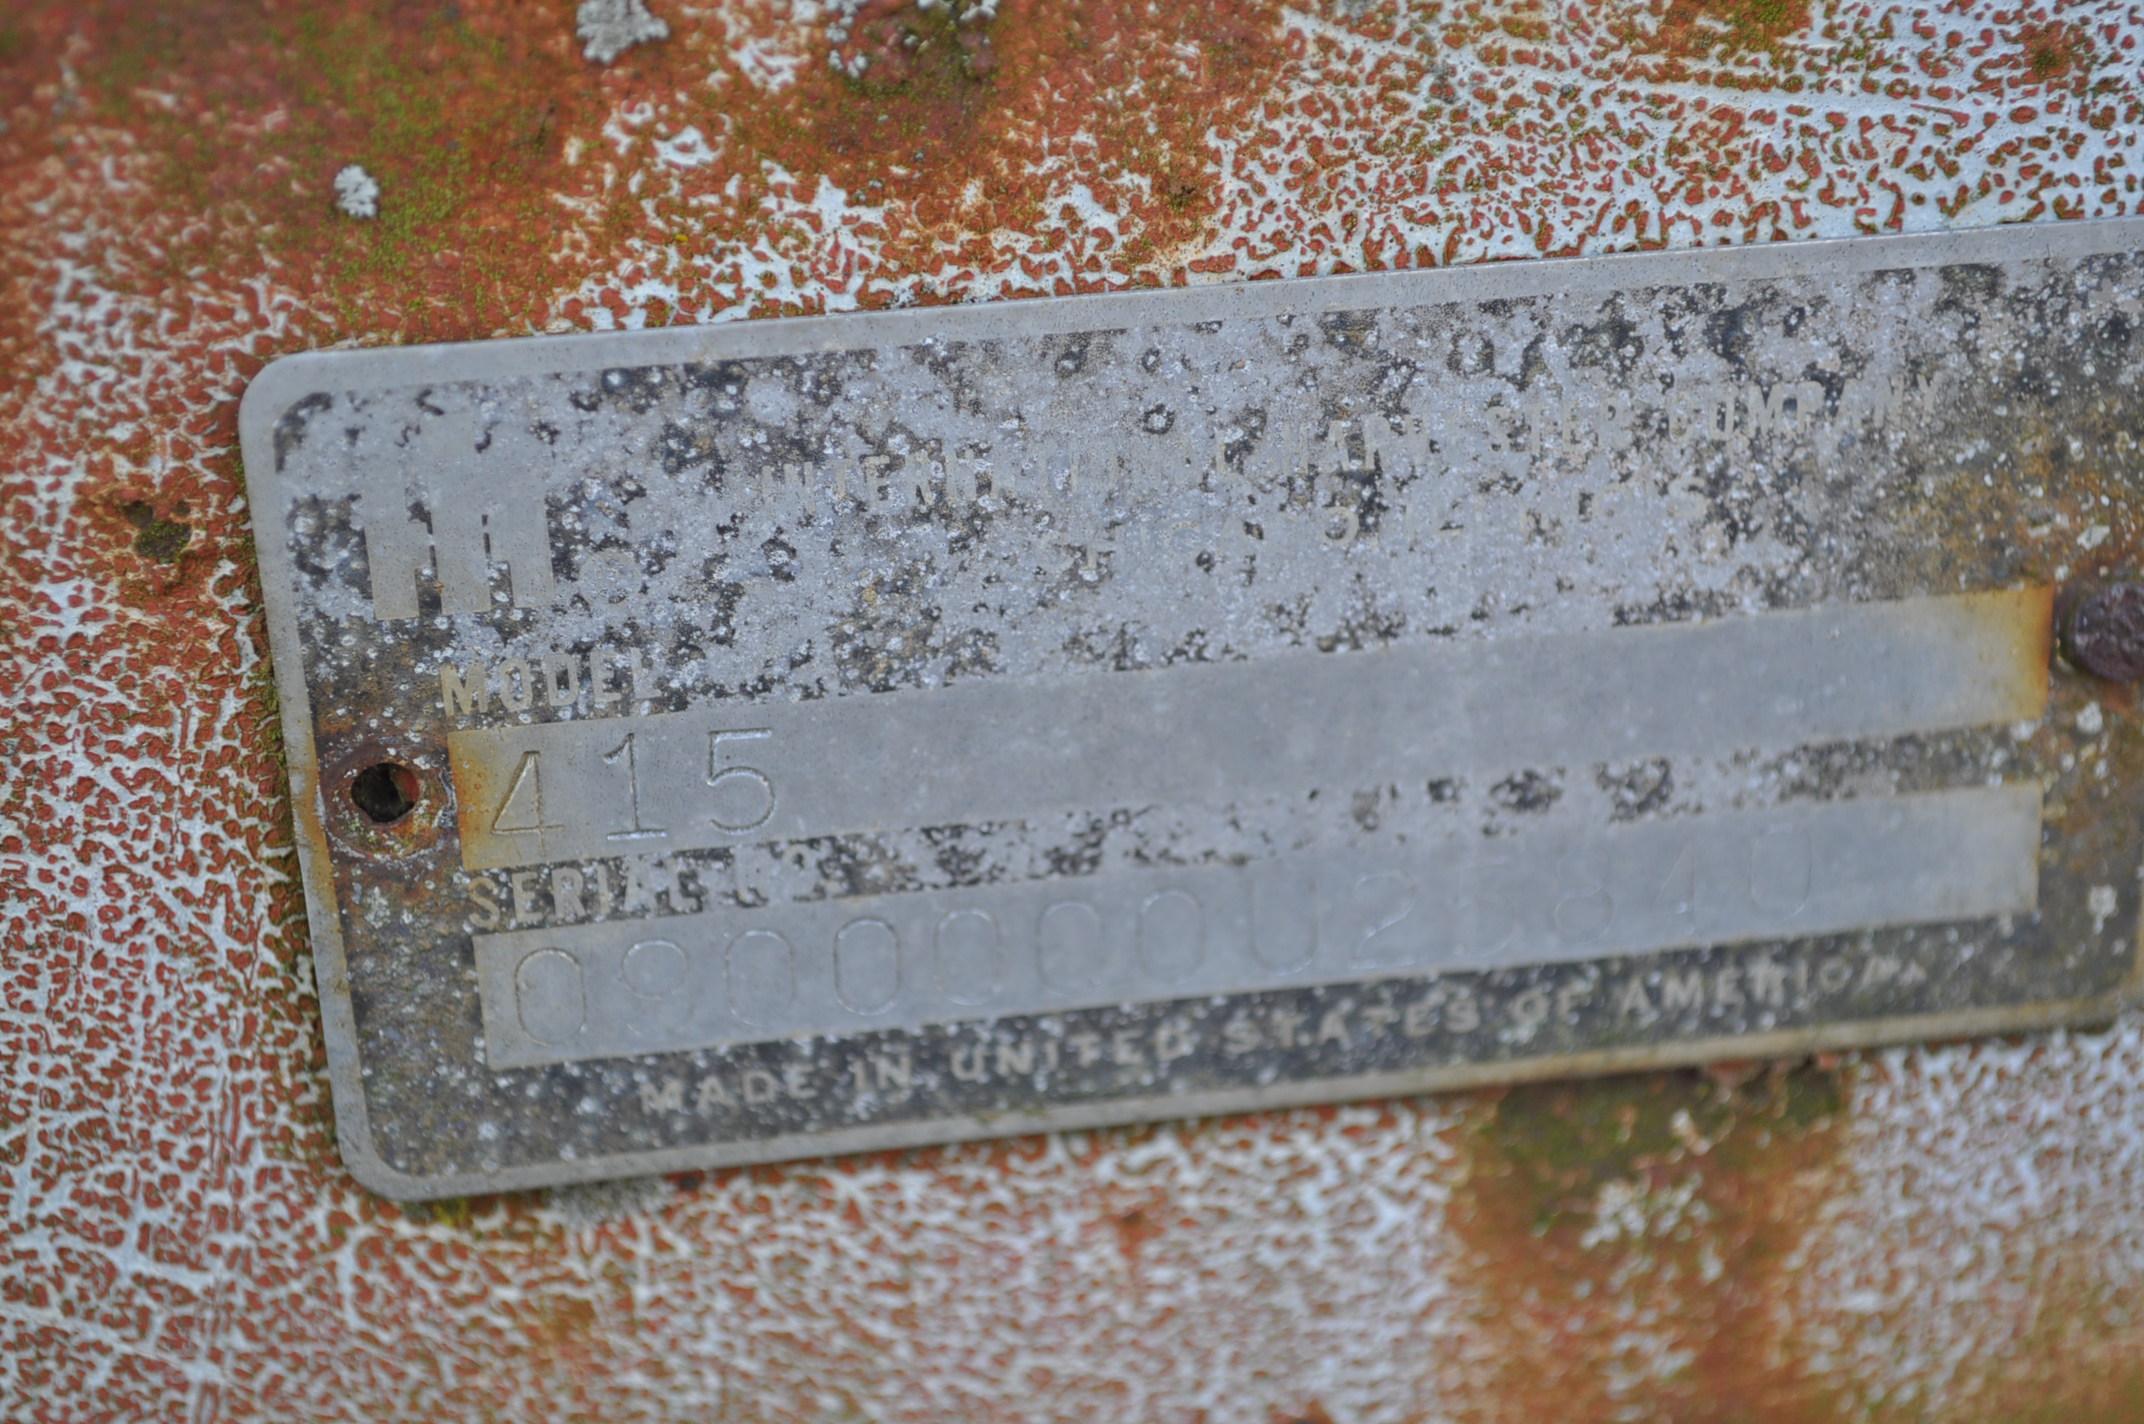 13' International 415 cultimulcher, rear hitch - Image 7 of 10